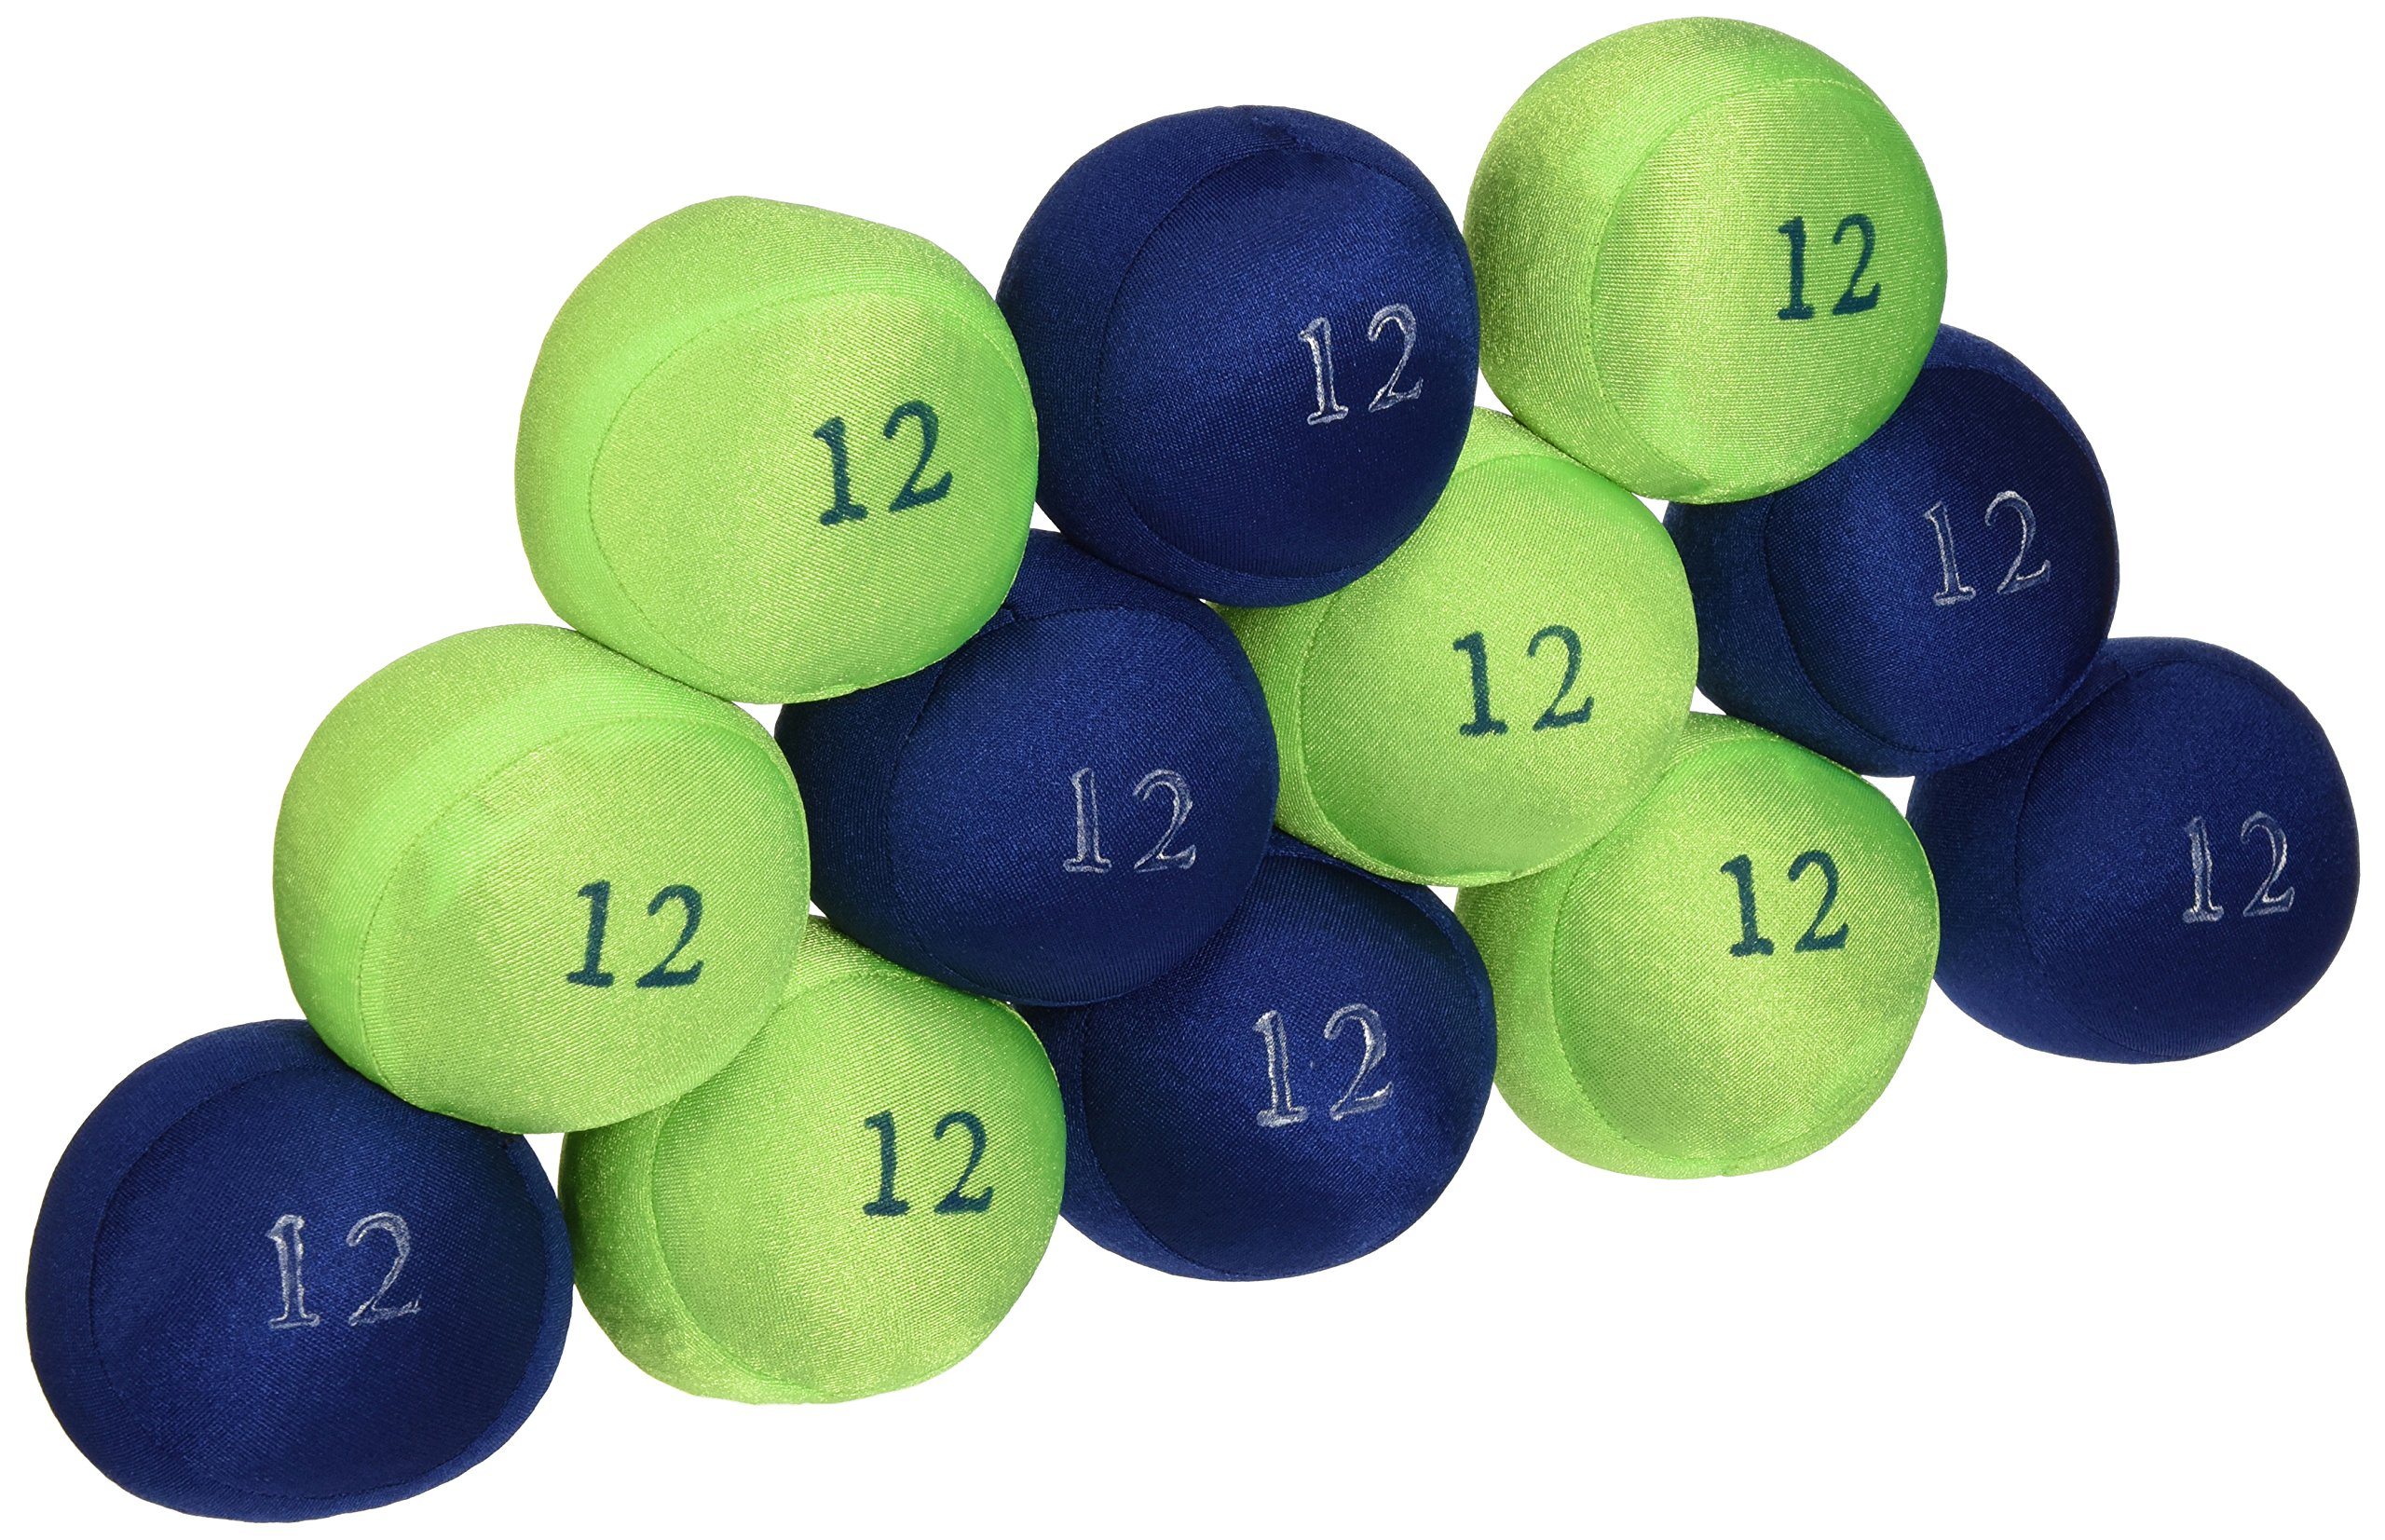 Lavender Luvies Lavender Stress Balls, Seahawks 12th Man - 12 Pack